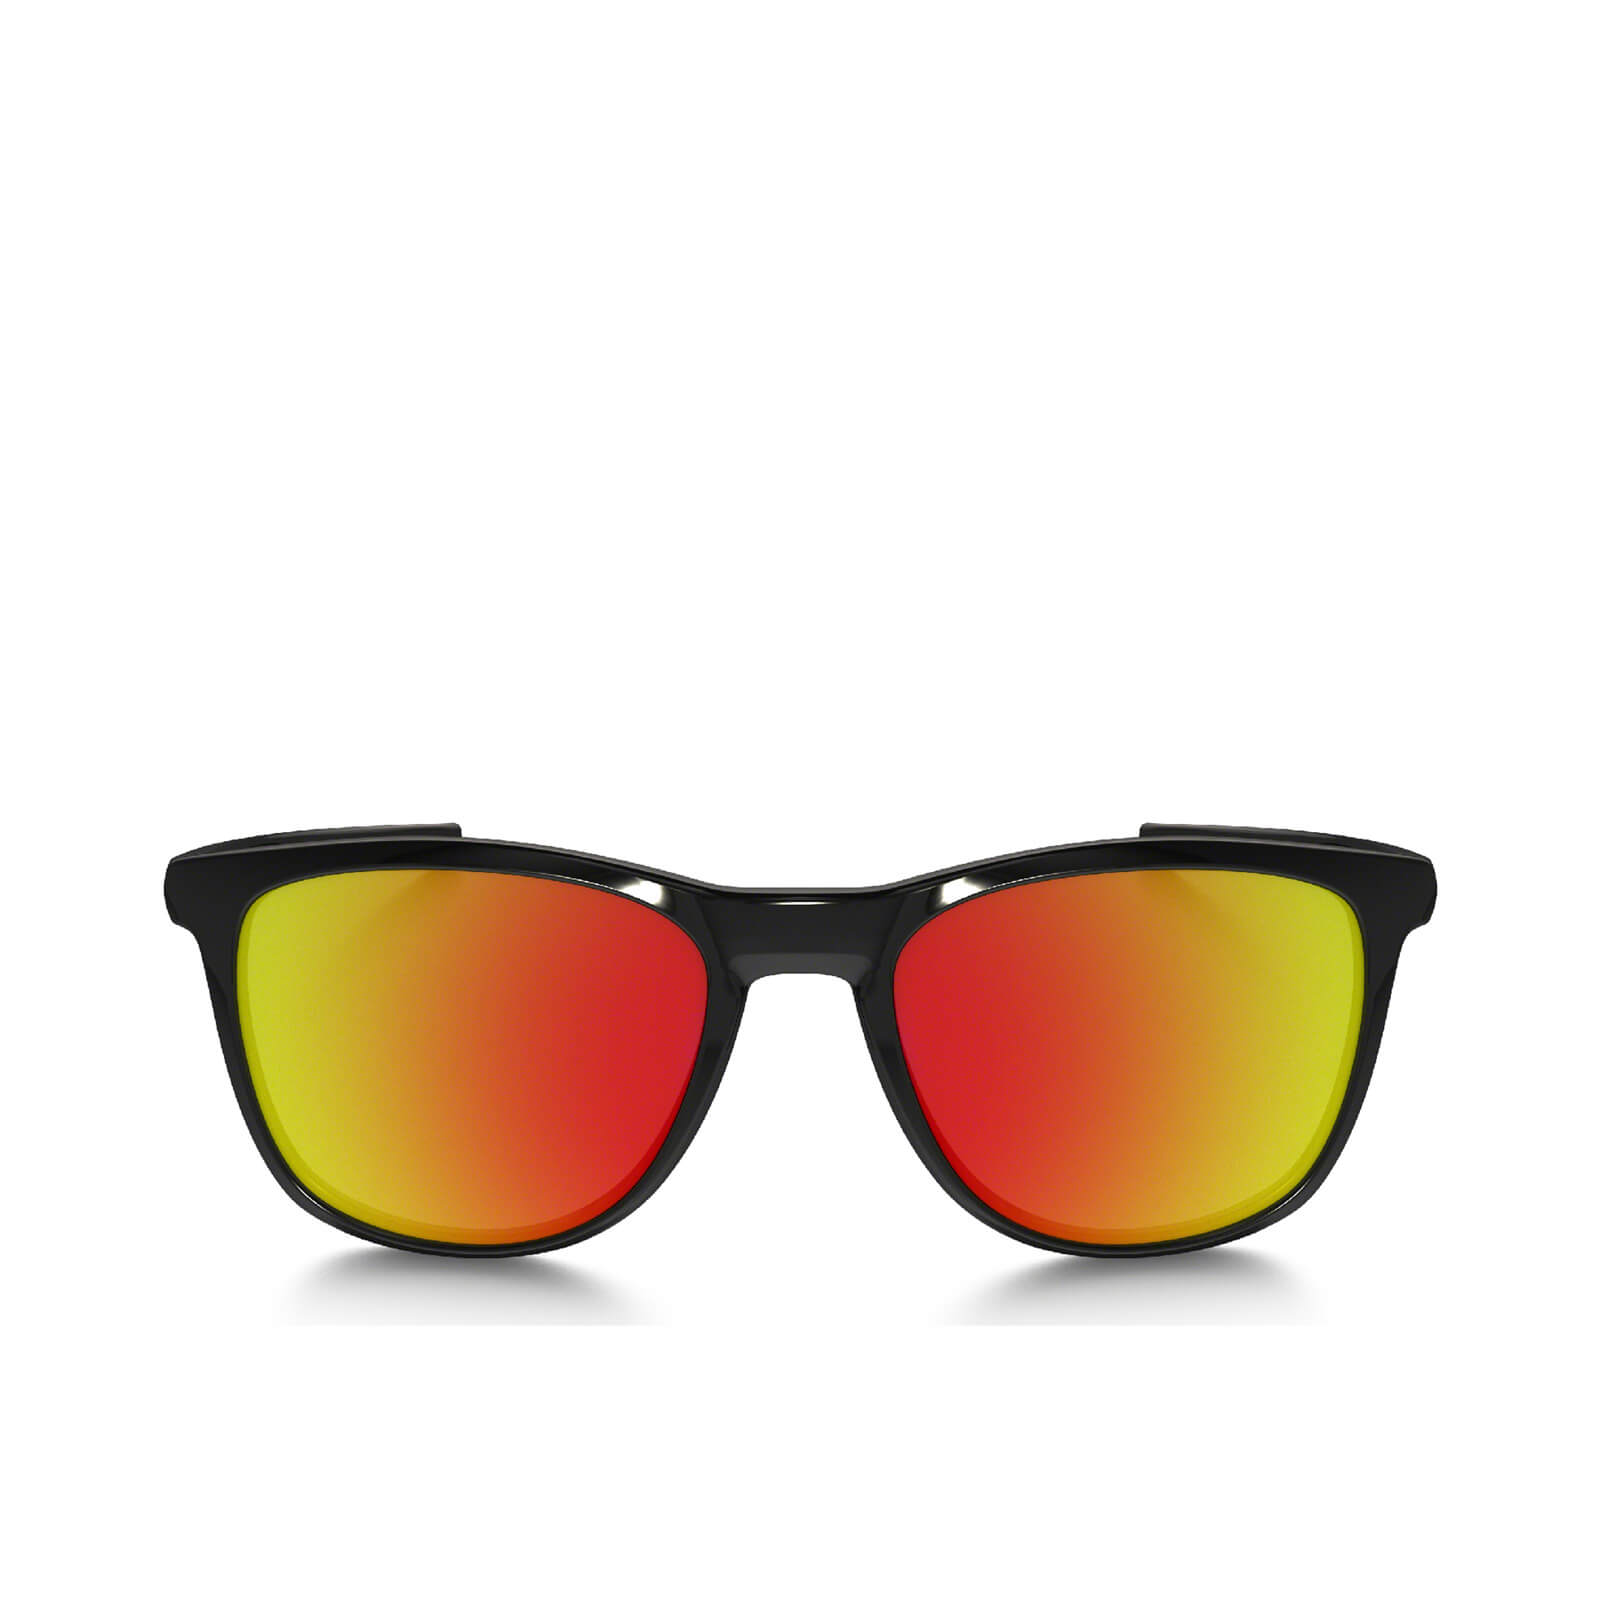 f4b3390699 Oakley Trillbe X Polarized Sunglasses - Black Ruby Iridium ...